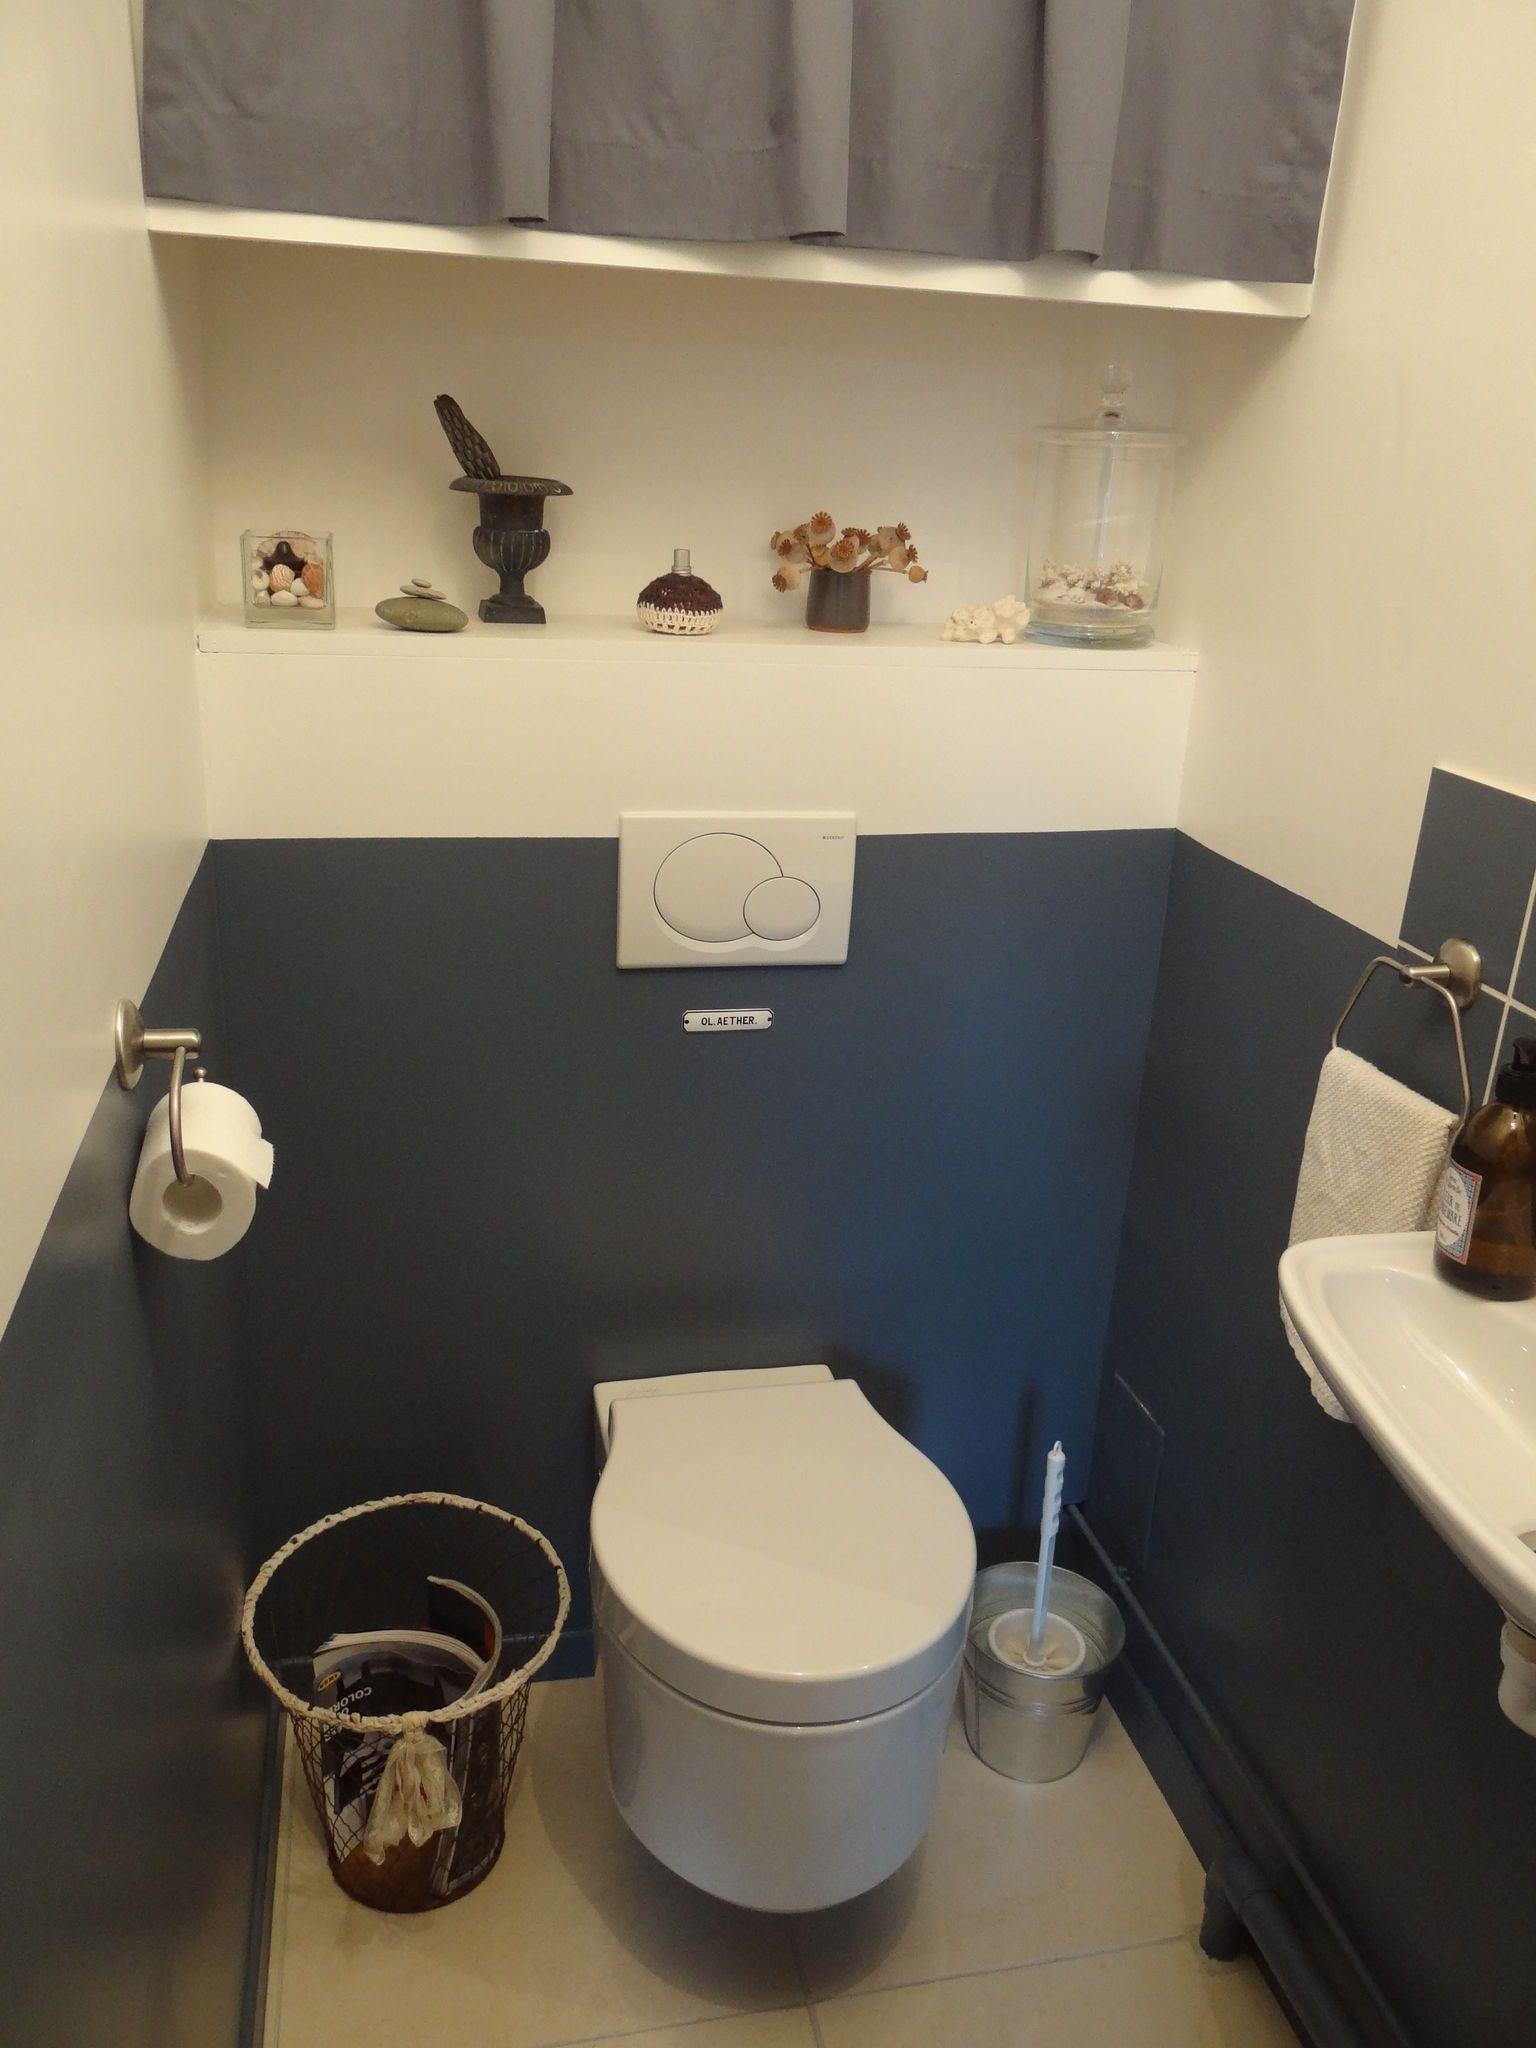 006 4 deco deco et compagnie. Black Bedroom Furniture Sets. Home Design Ideas